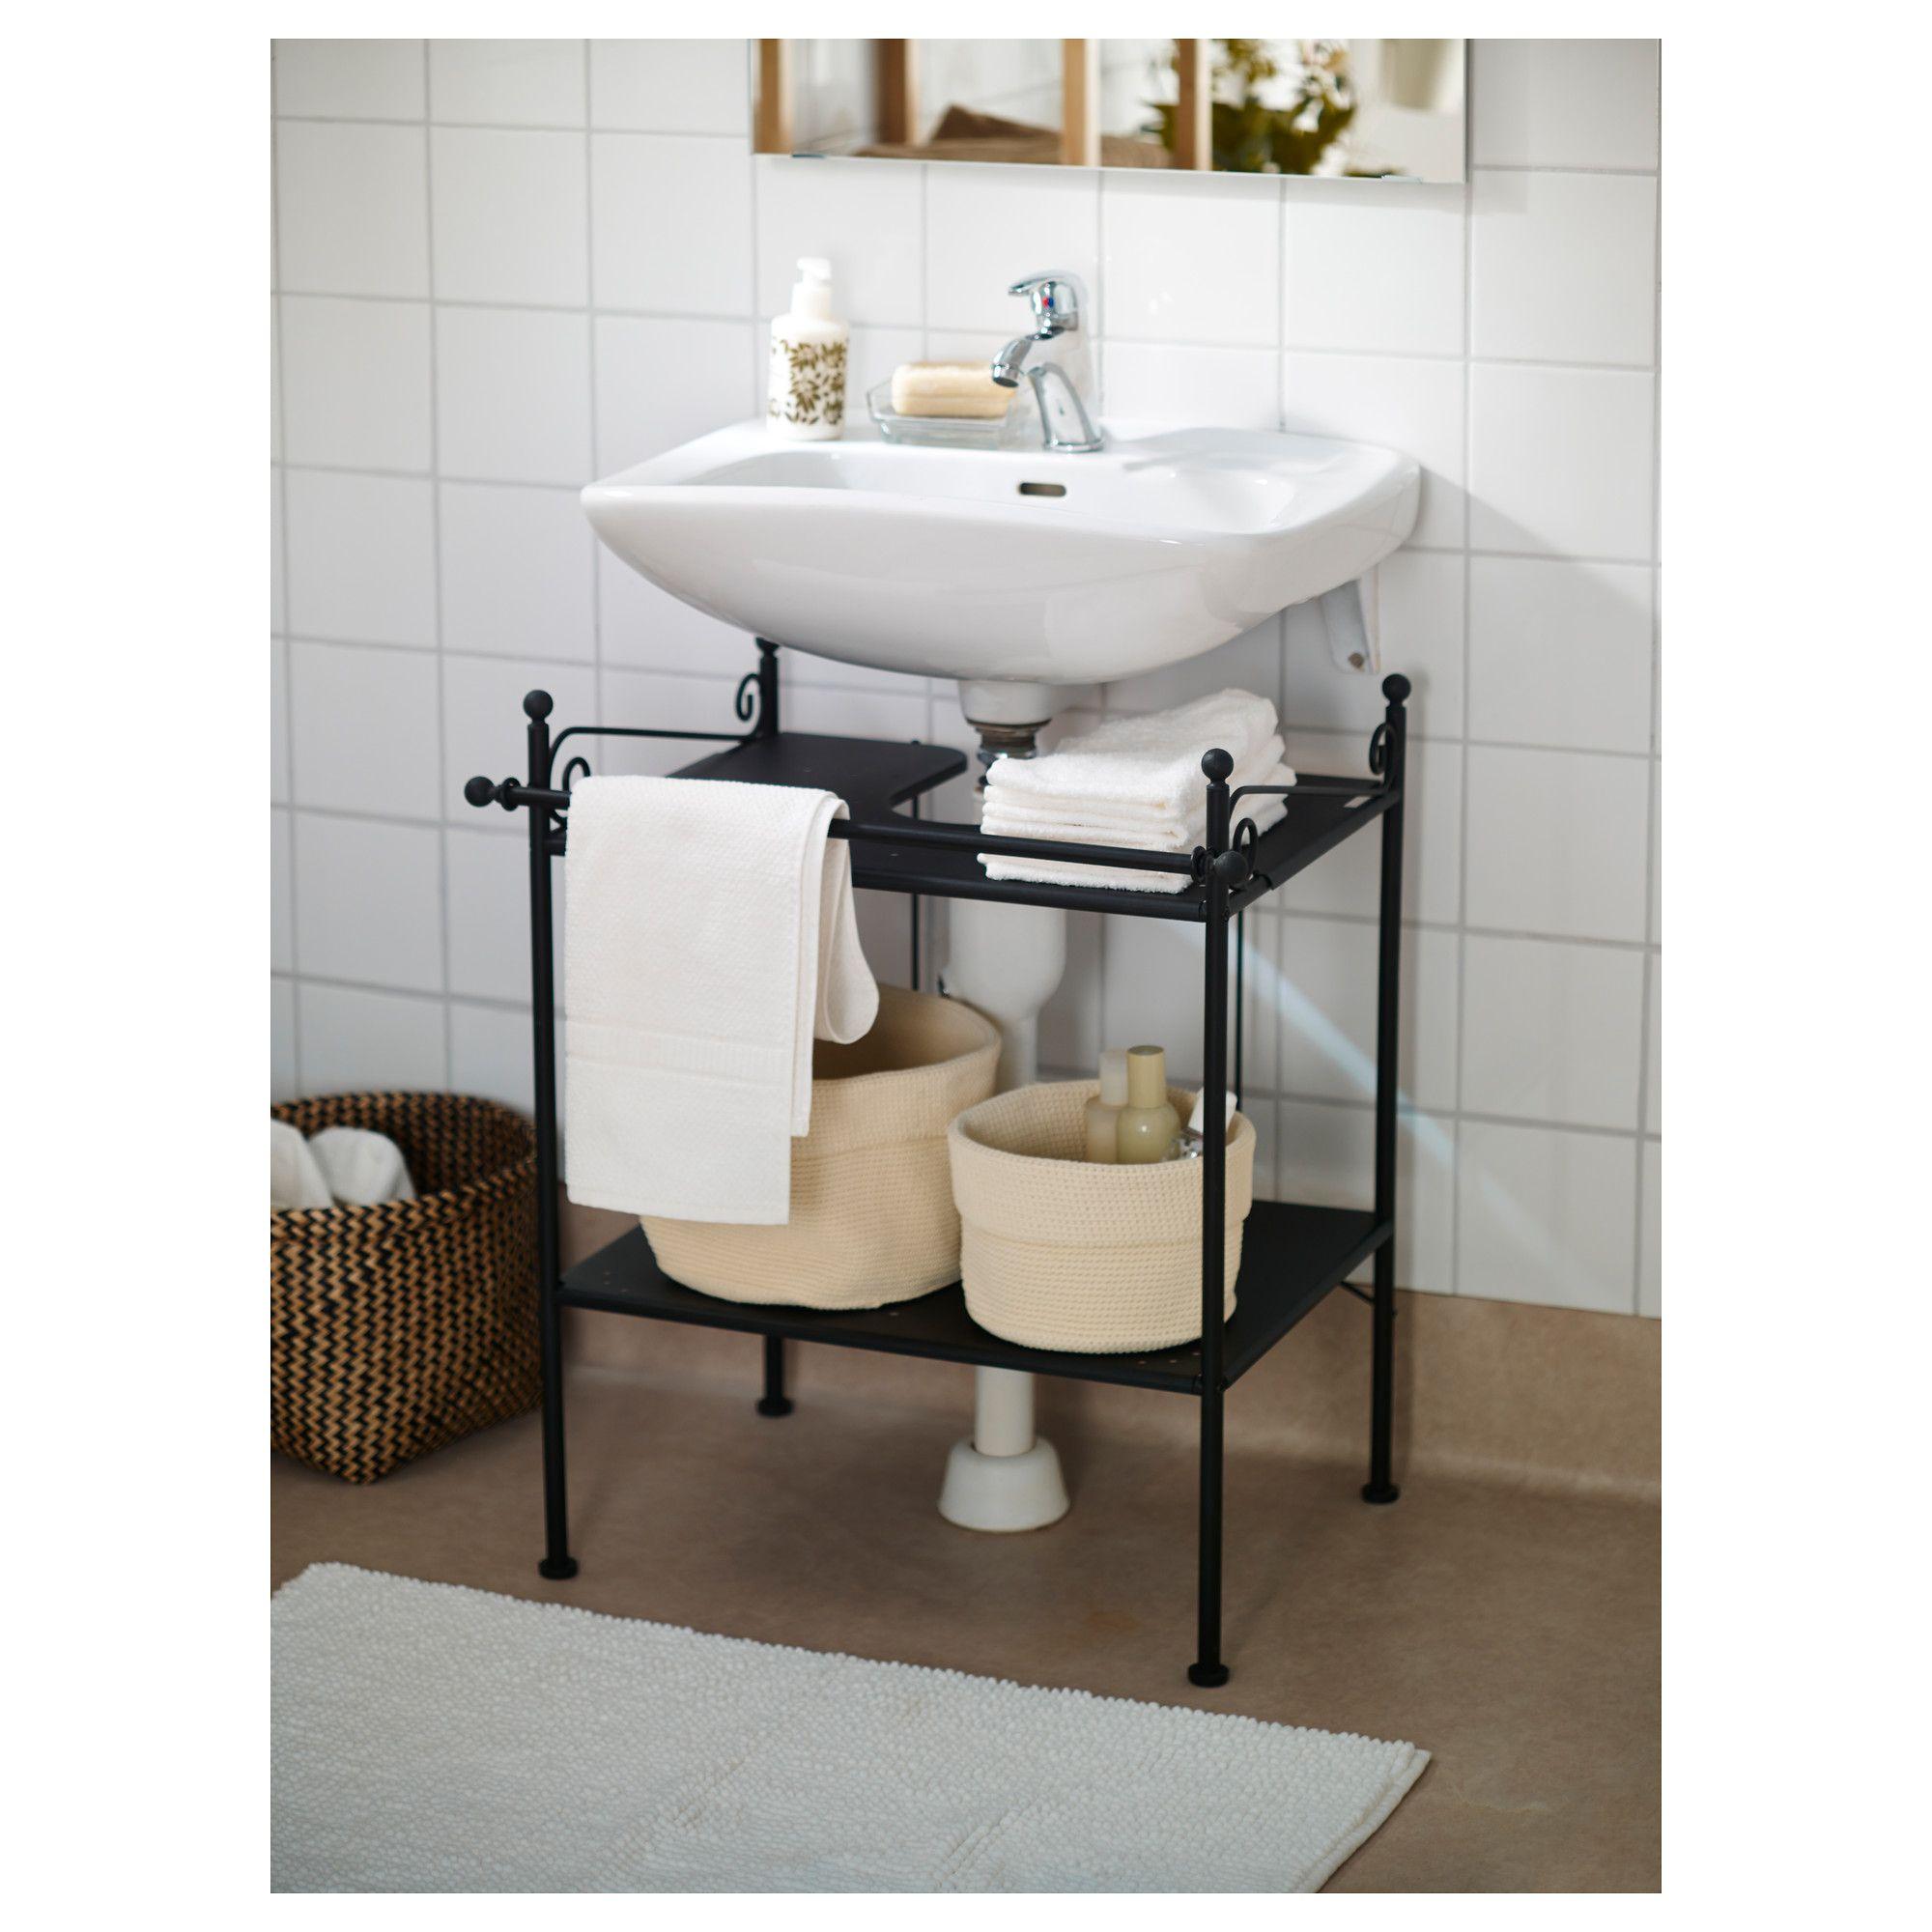 RONNSKAR Ράφι νιπτήρα - IKEA